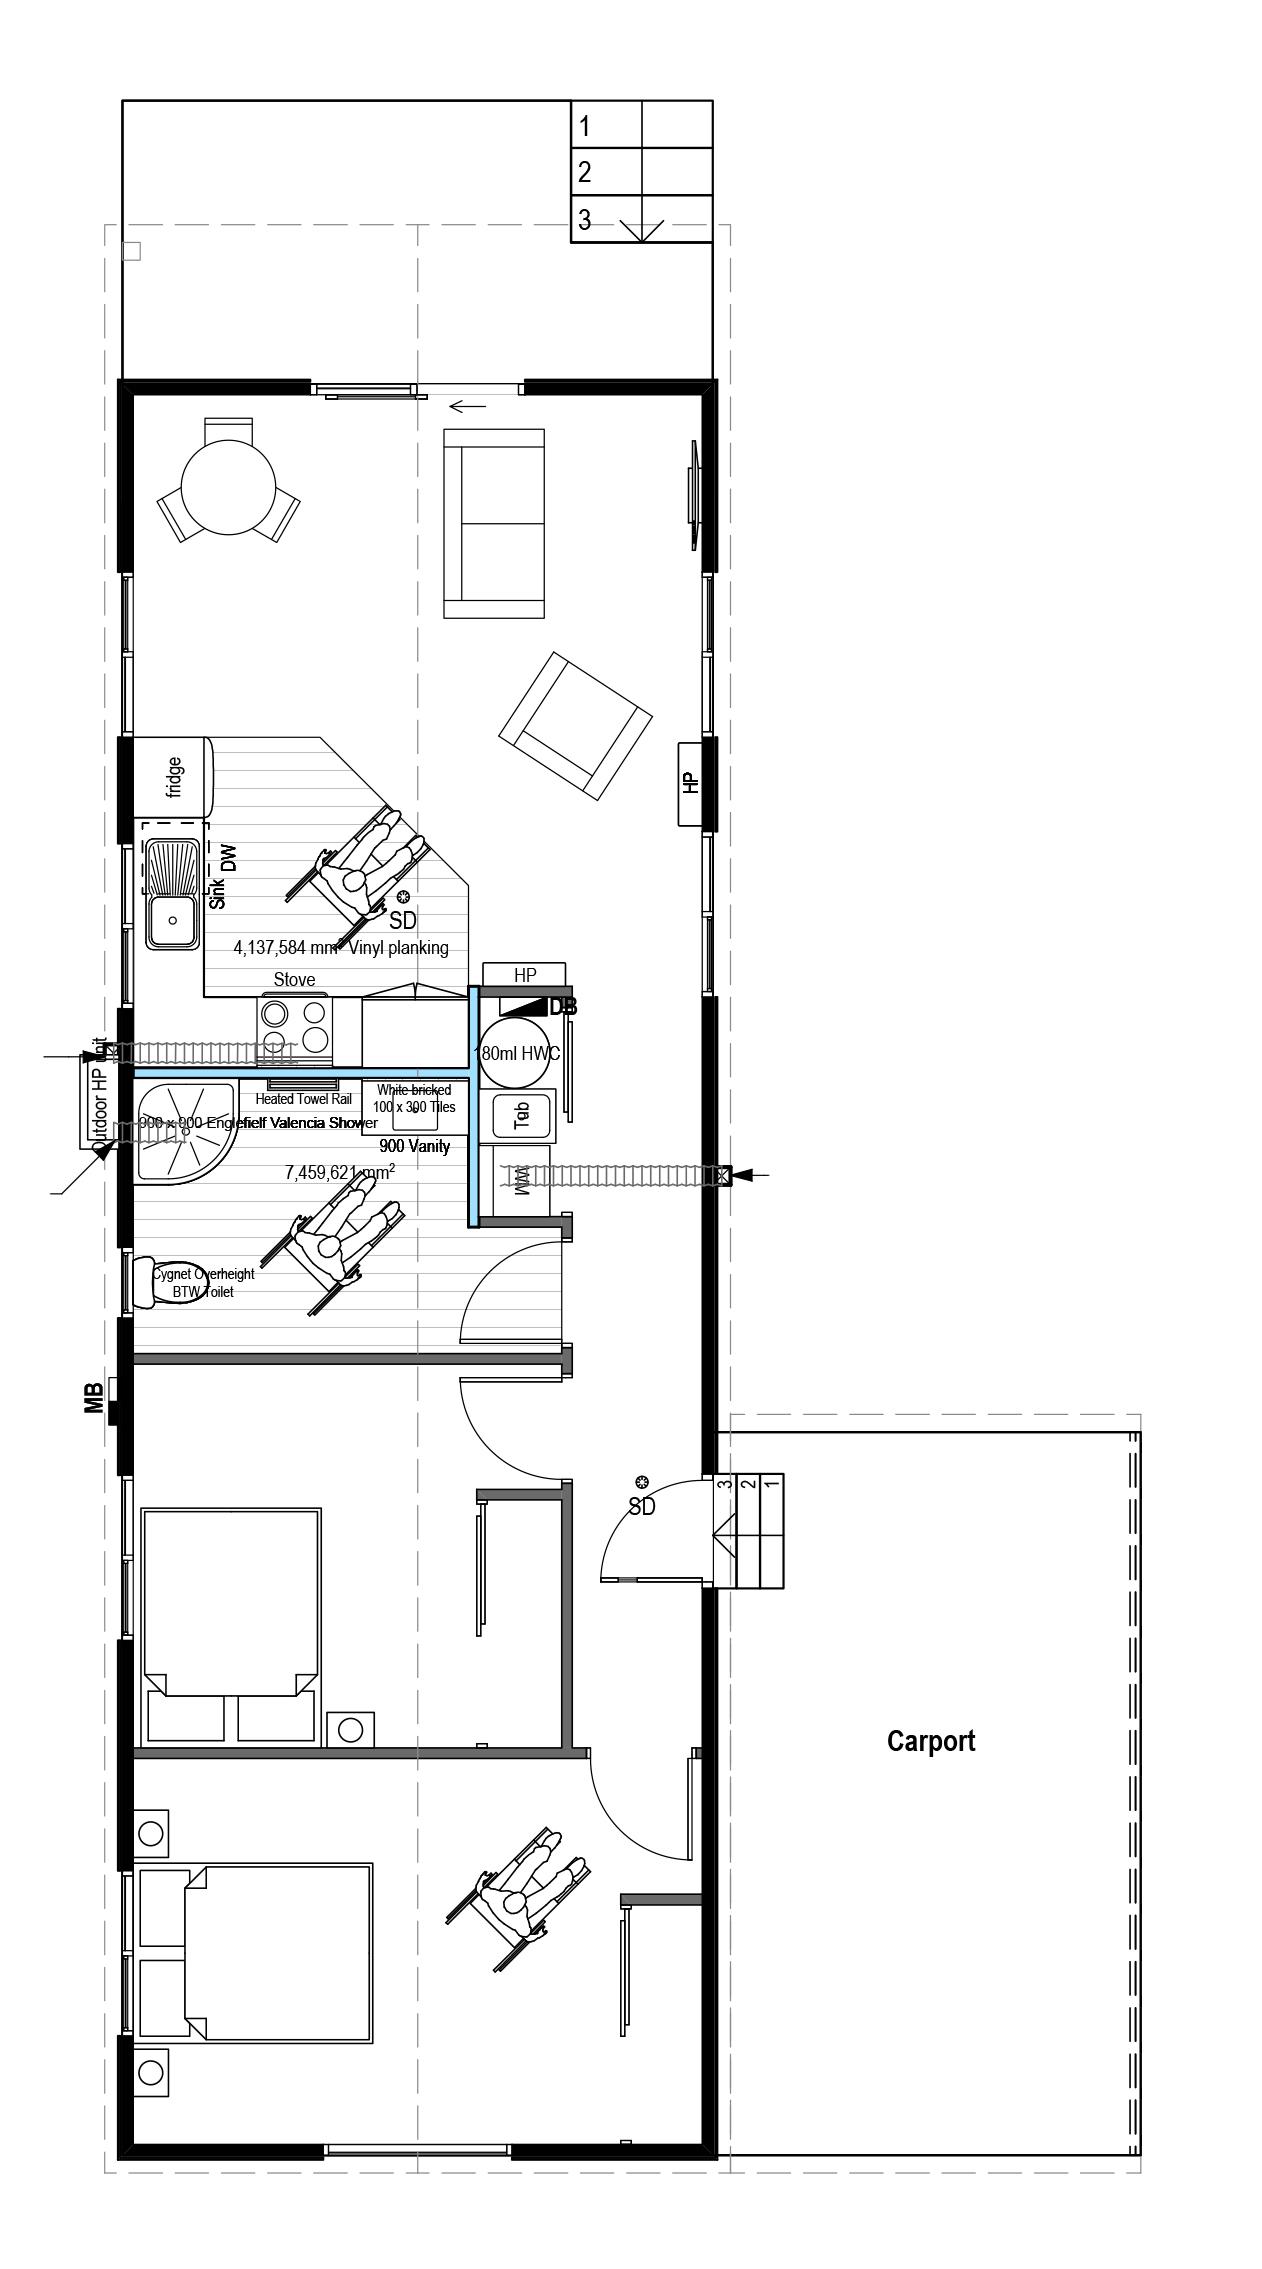 75 sqm Floor Plan w carport.jpg